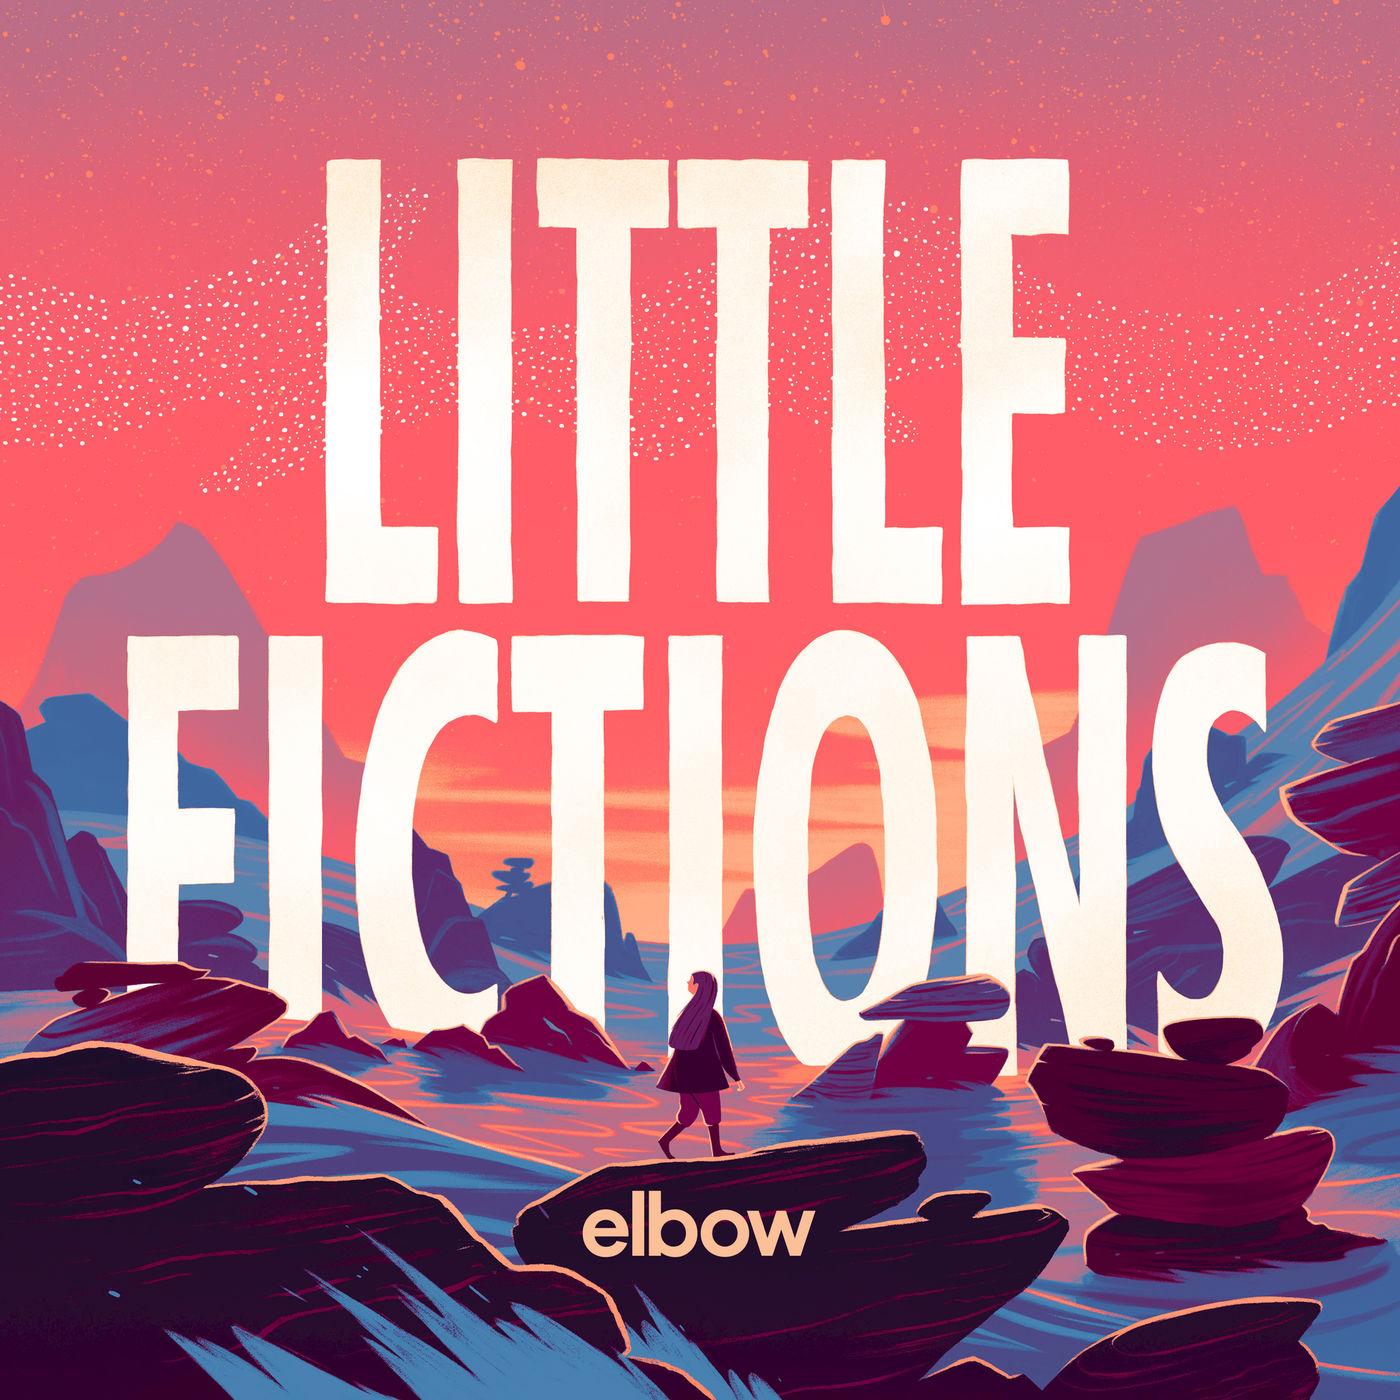 Little Fictions - Elbow